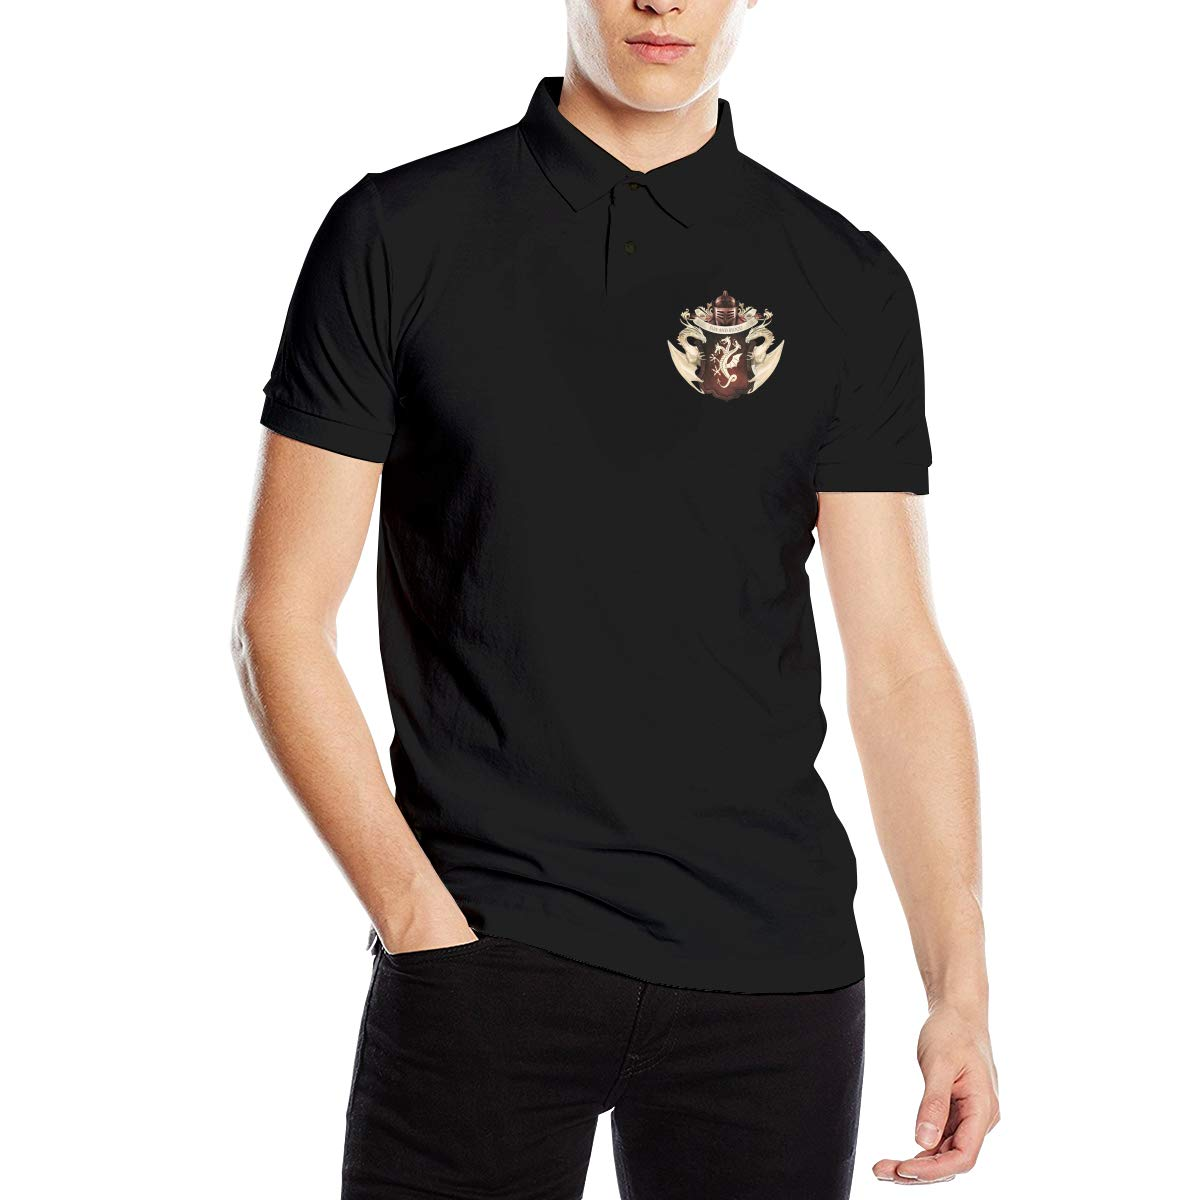 HUALA New Custom Game of/_THR/_Ones Targaryen Dynasty Fashion Polo Short Sleeve for Men Black